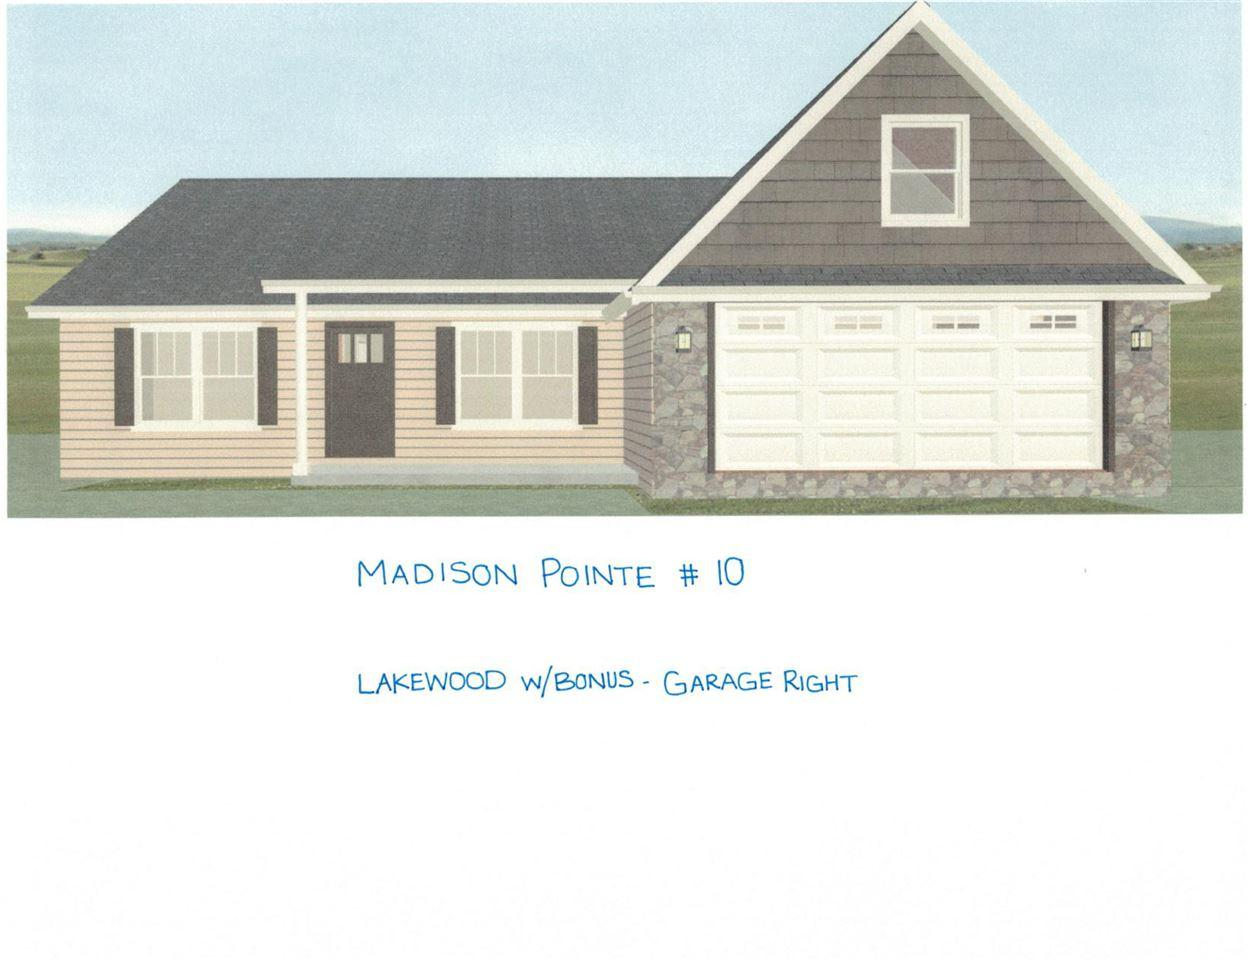 Lot 41 Madison Pointe Drive, Seneca, SC 29678 (MLS #20179728) :: Les Walden Real Estate